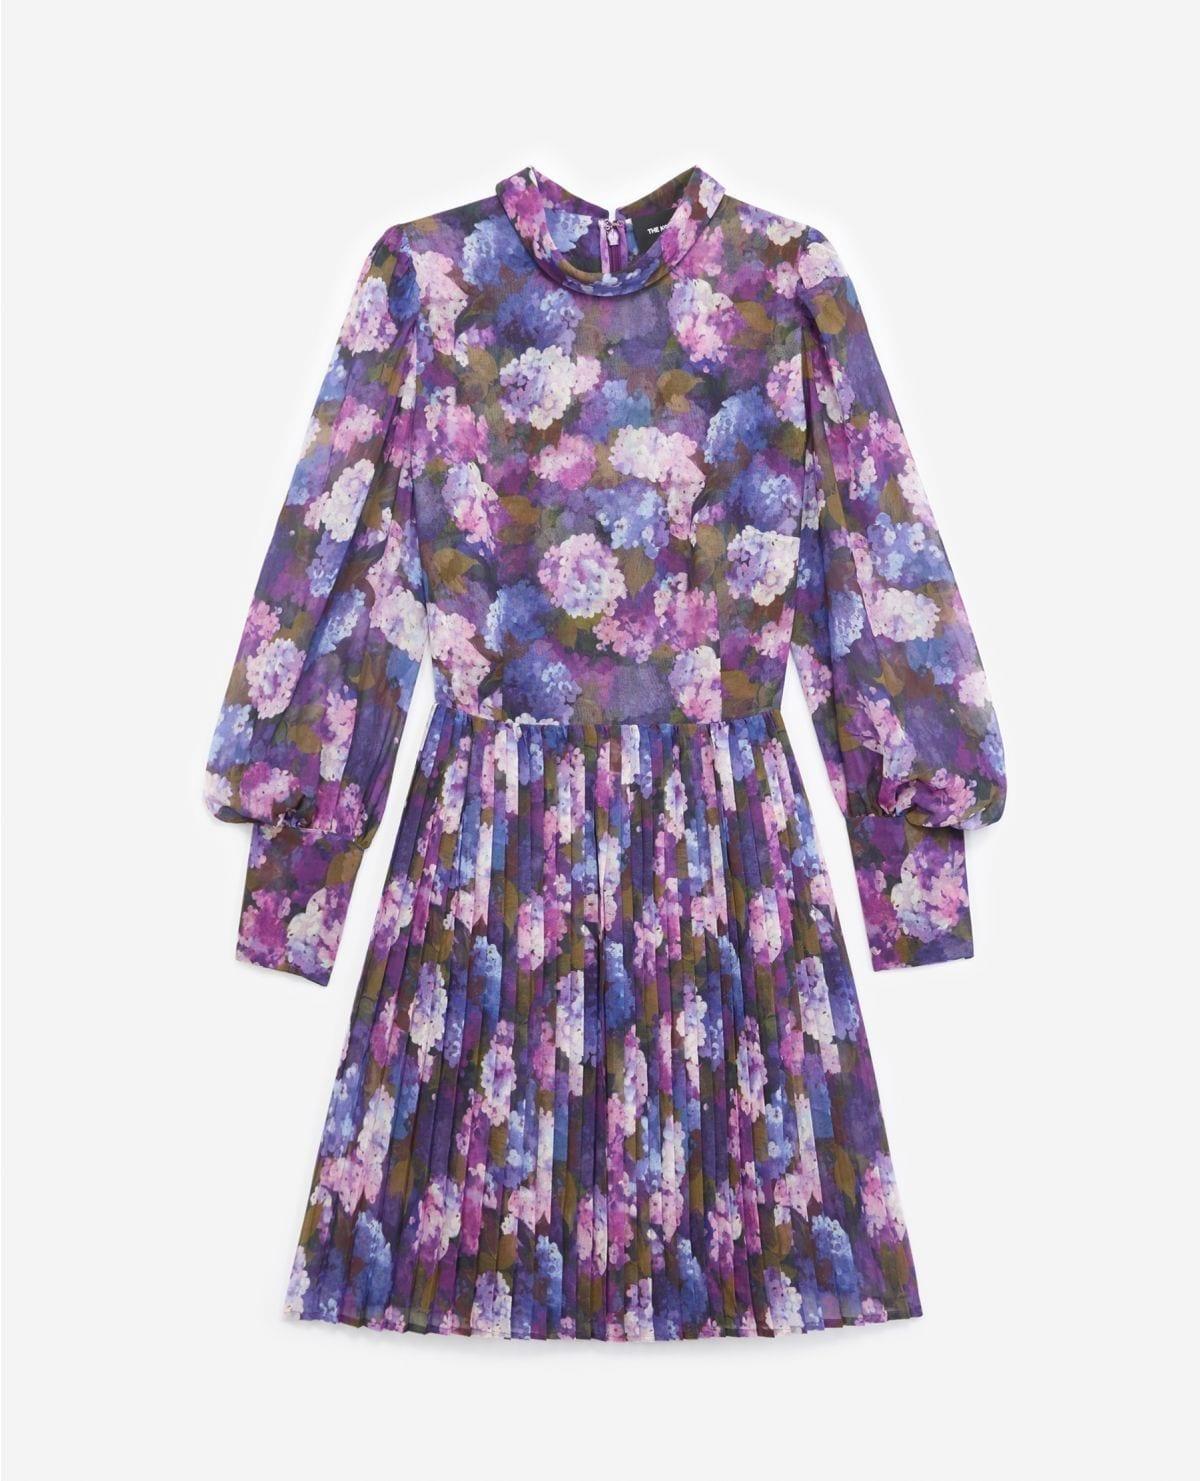 THE KOOPLES Flowing Pleated Dress